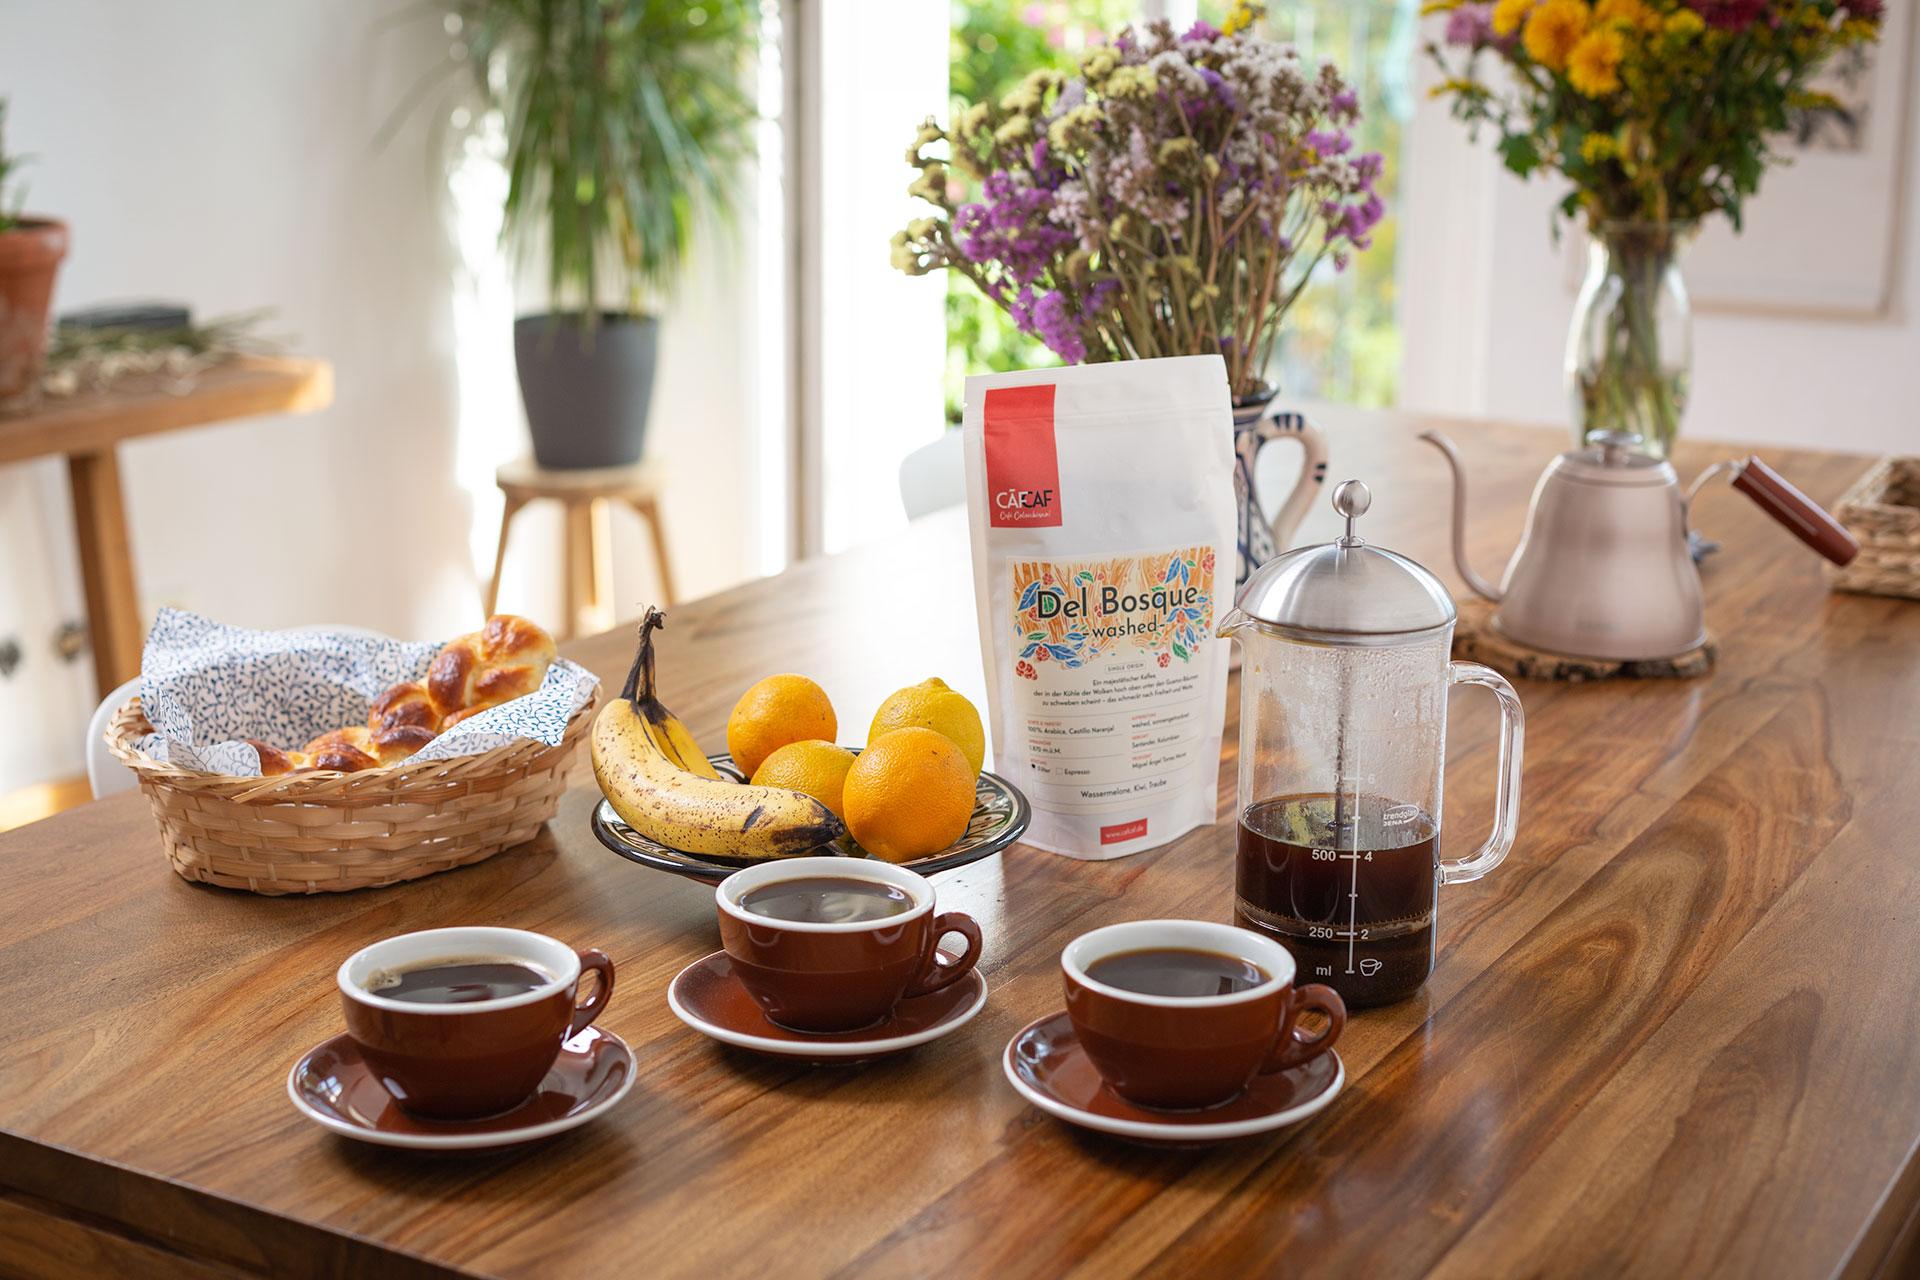 CafCaf Kaffee: der Geschmack Kolumbiens